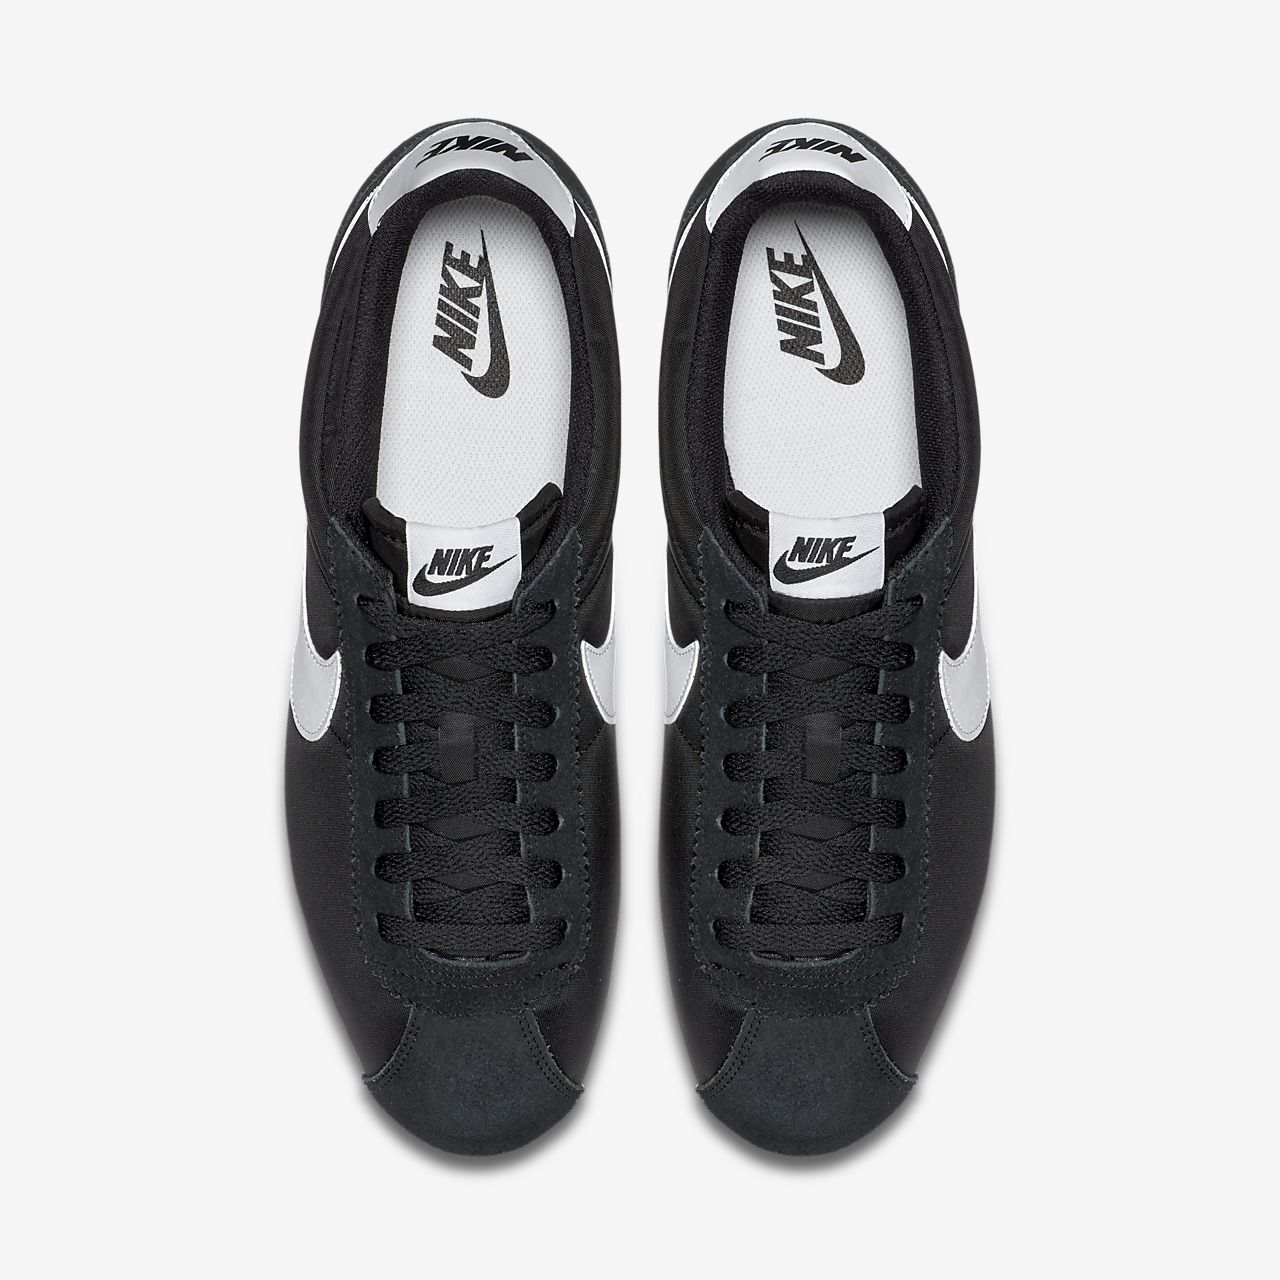 NylonFr Chaussure Mixte Classic Nike Cortez c5Rj4Aq3LS